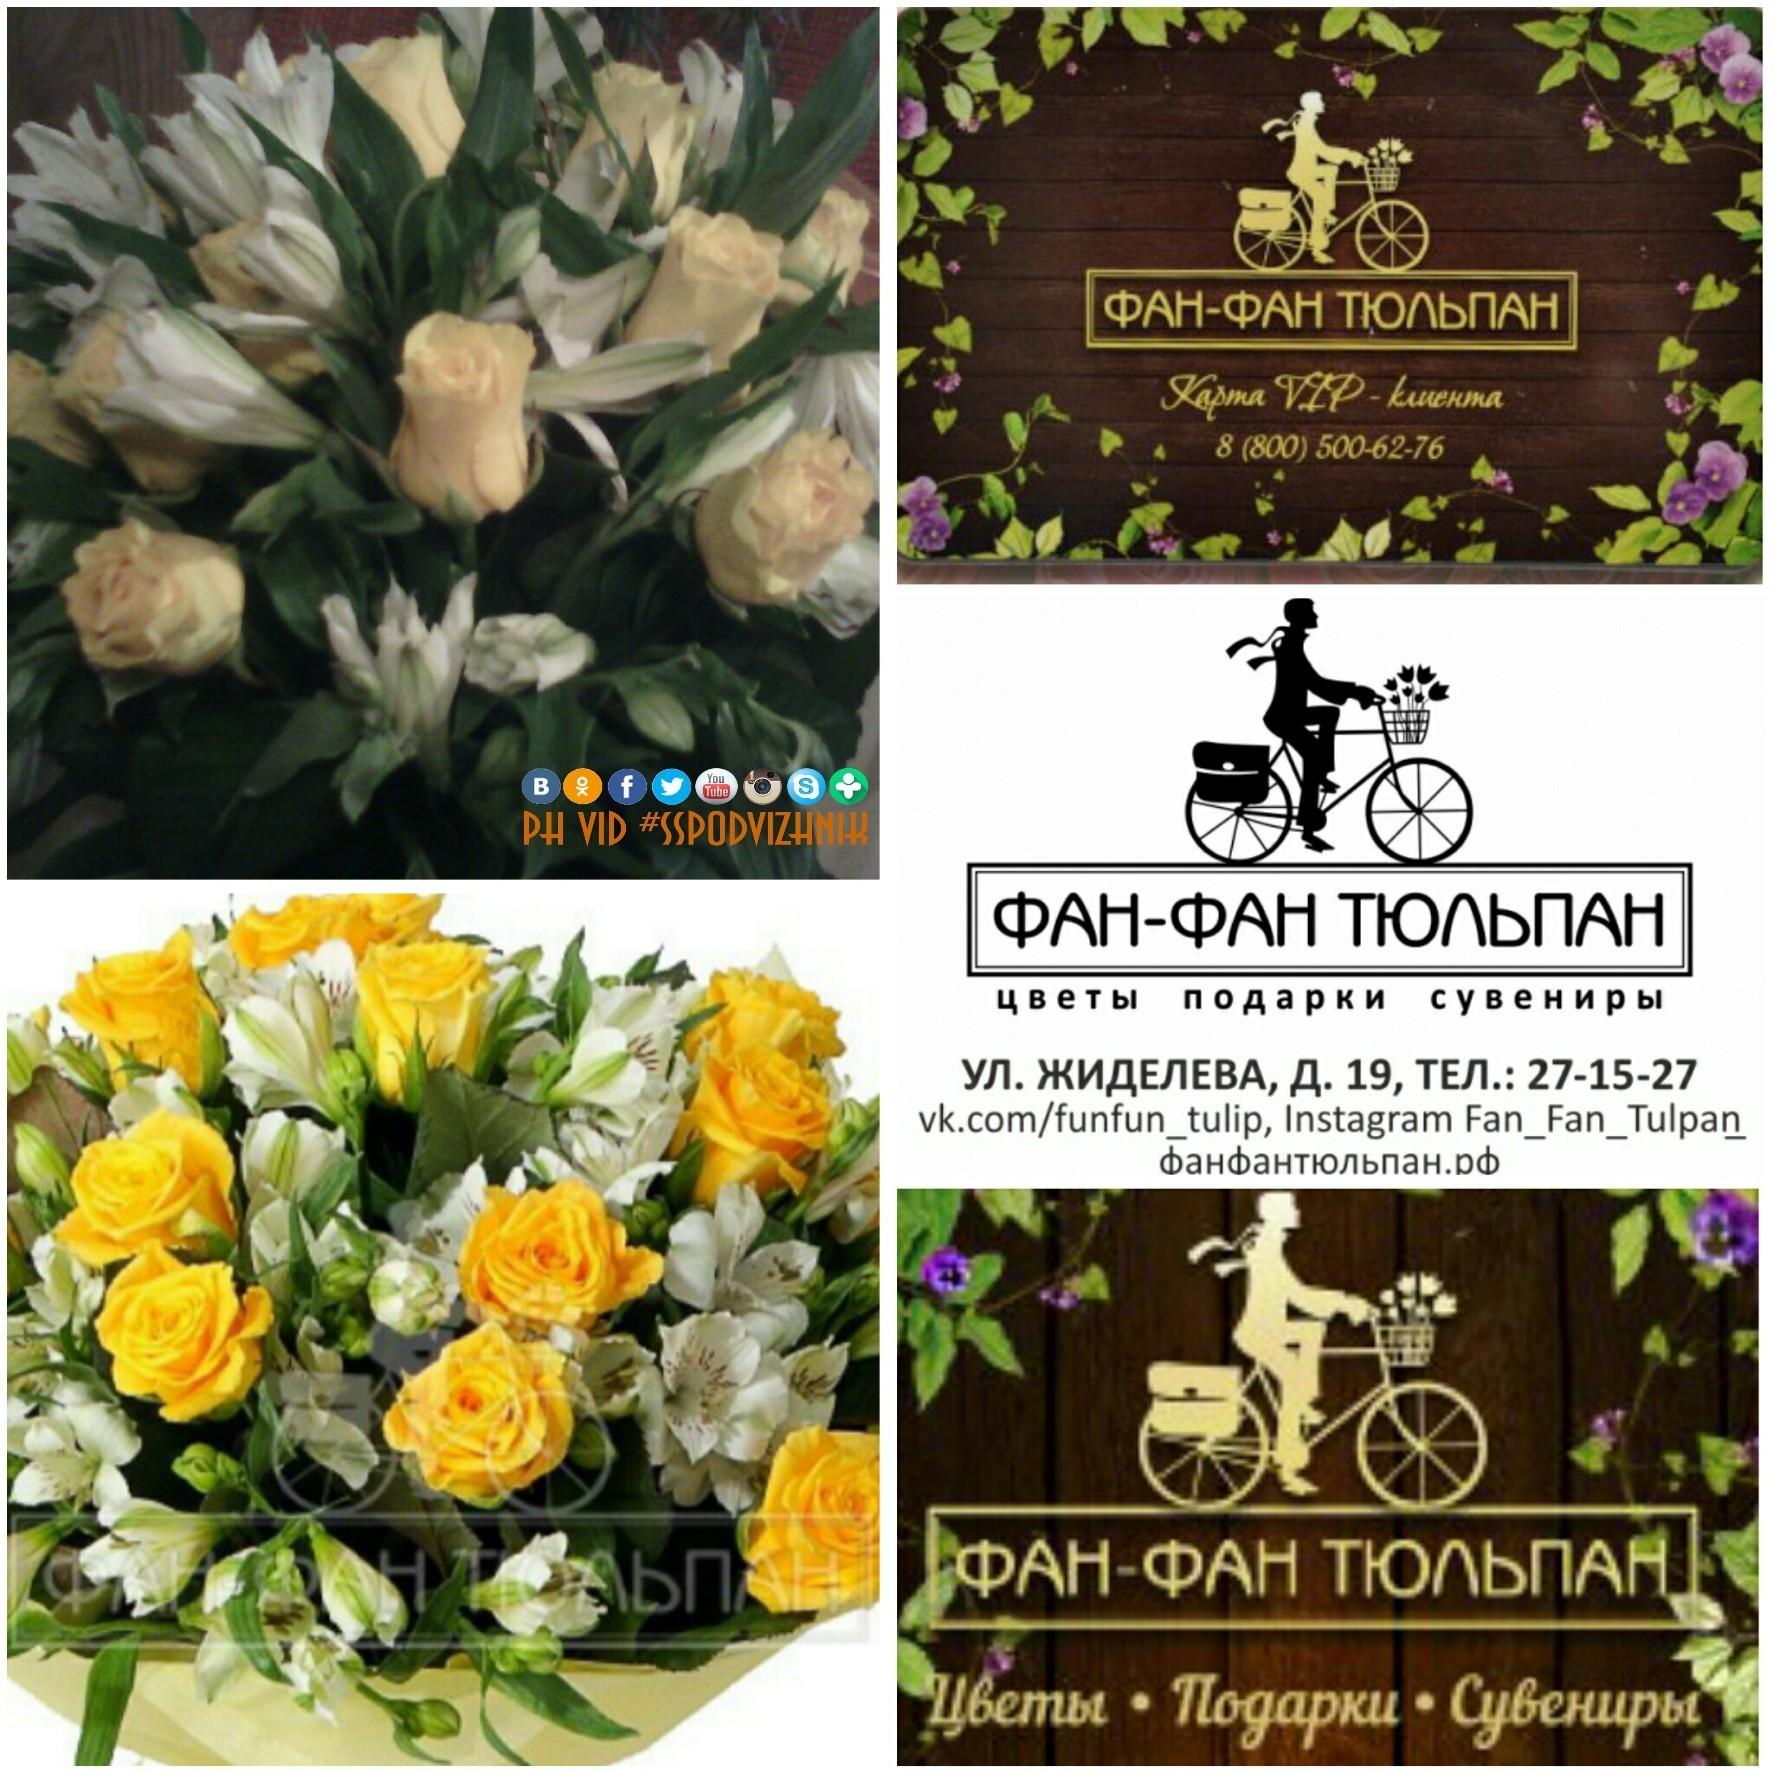 Цветы на заказ фан фан тюльпан екатеринбург